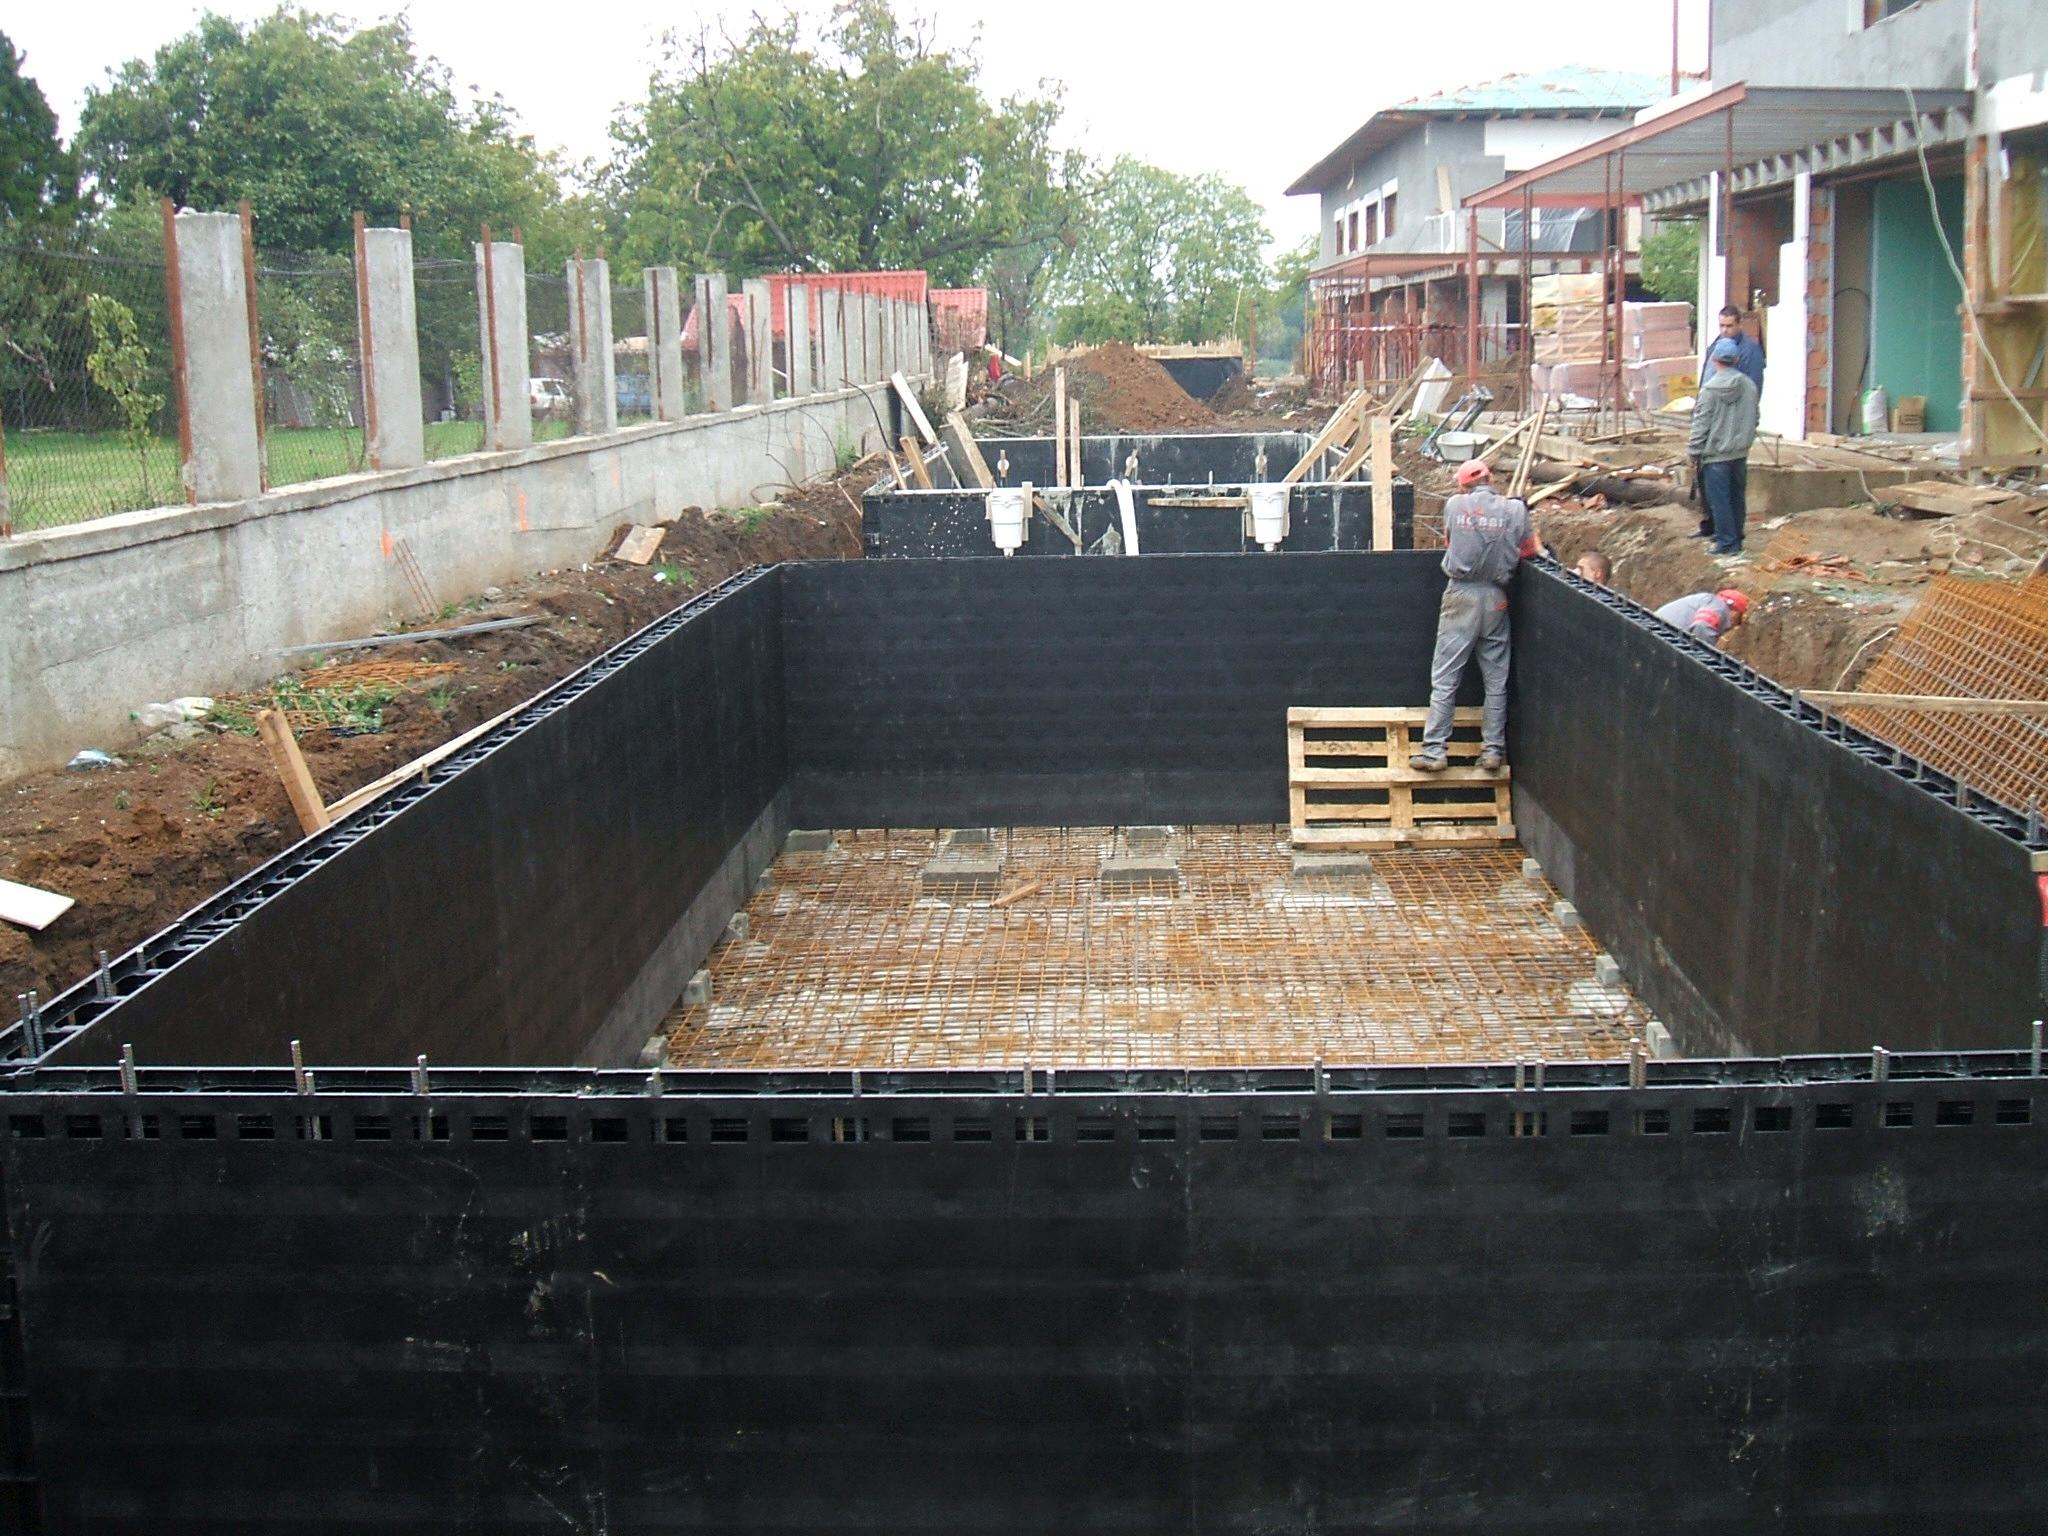 Piscina privata din beton cu cofrag pierdut - Faze montaj 9 MONDIAL PISCINE - Poza 9